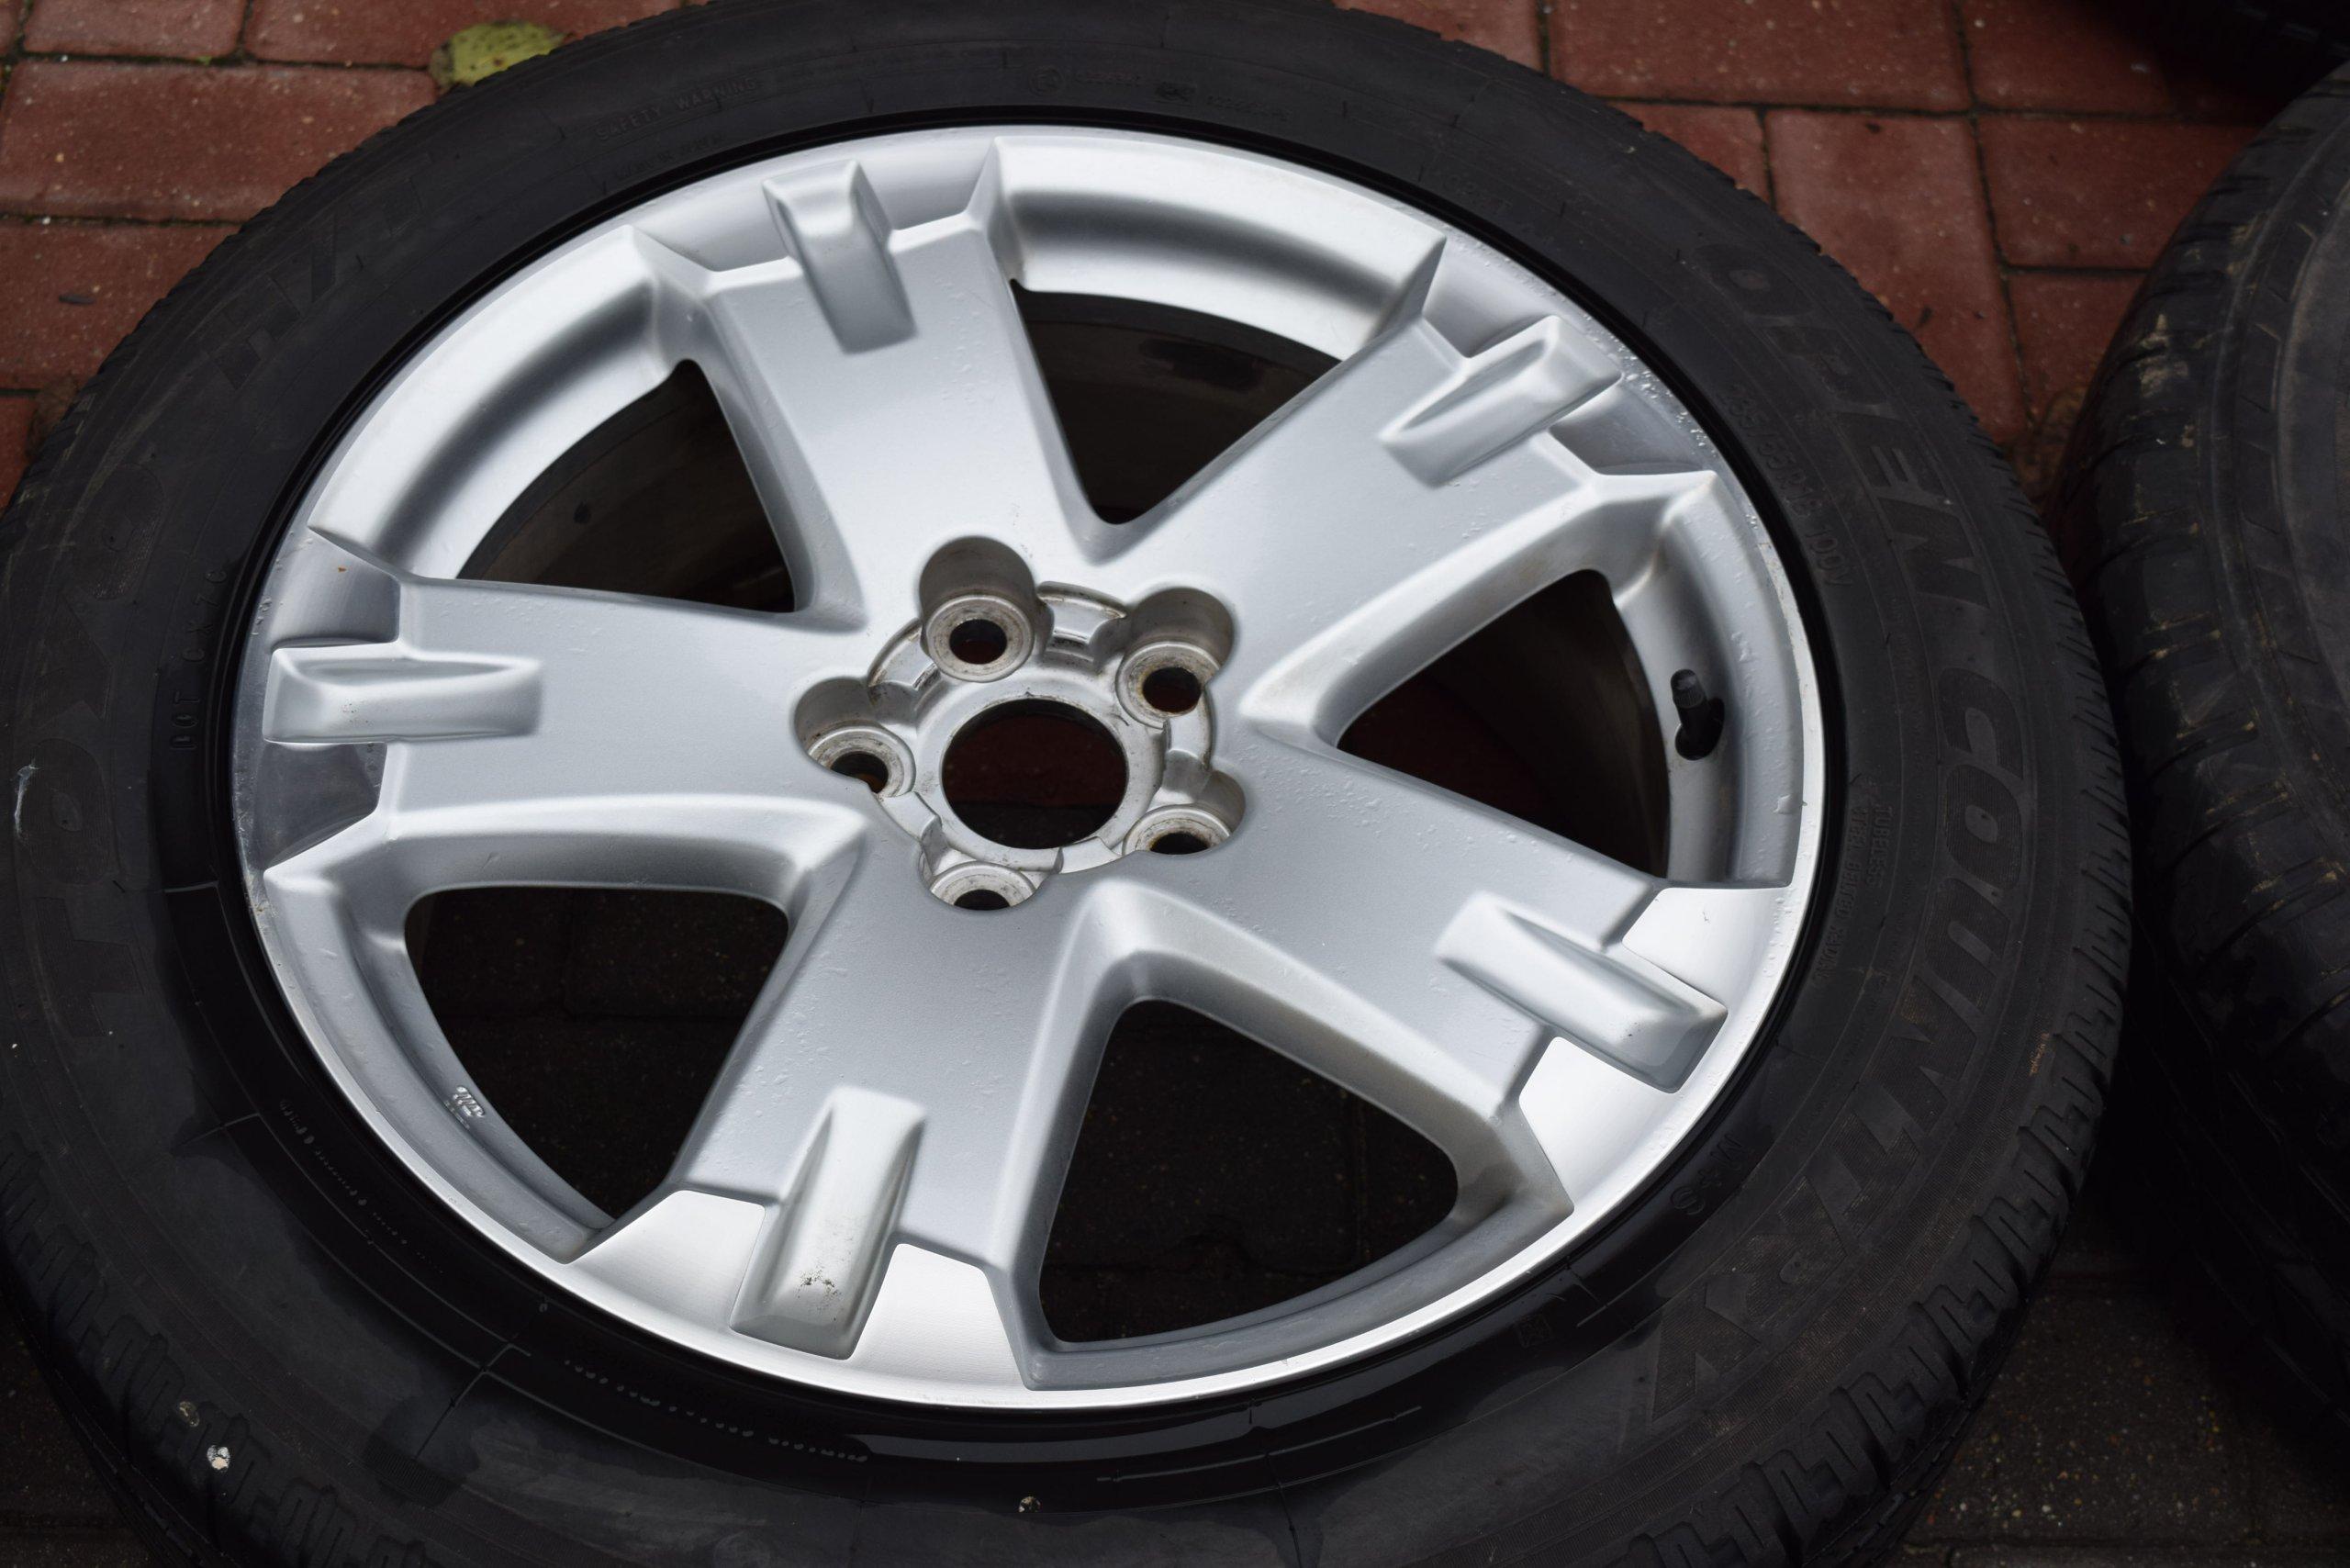 Toyota Rav 4 Opony Zimowe 2355518 Felgi Okazja 7232520995